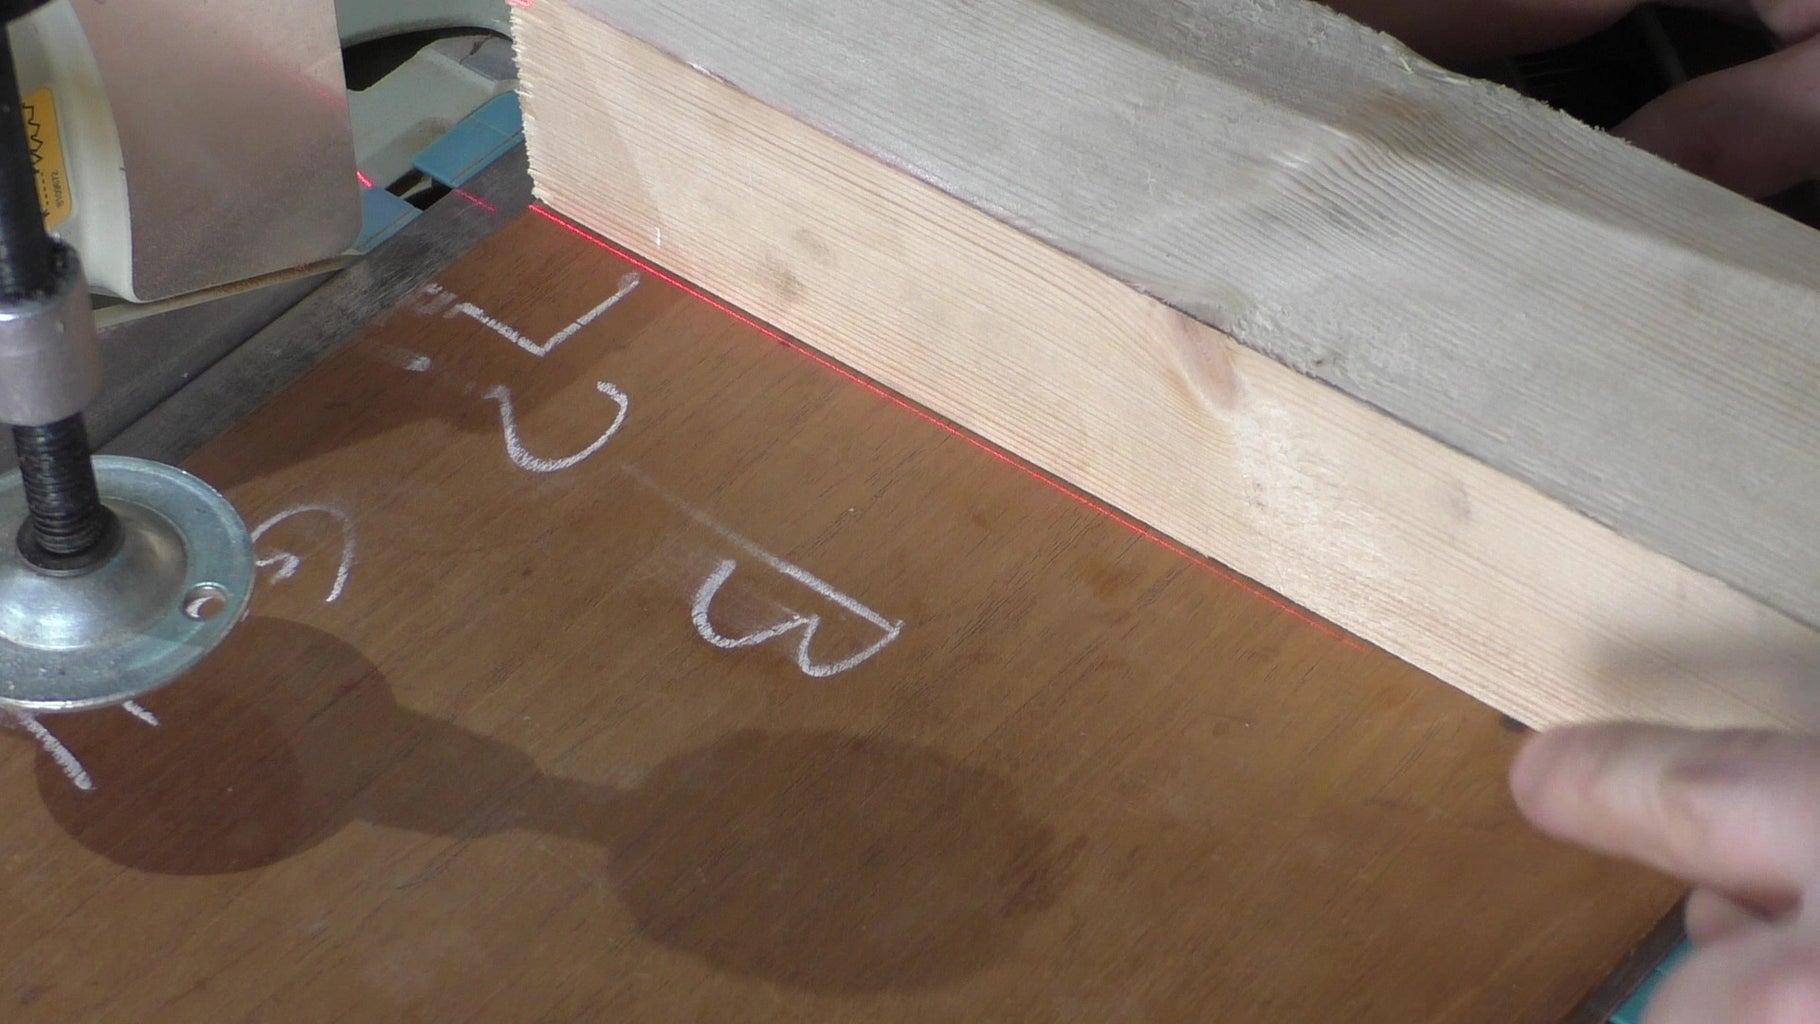 Setting the Back Fence Angle